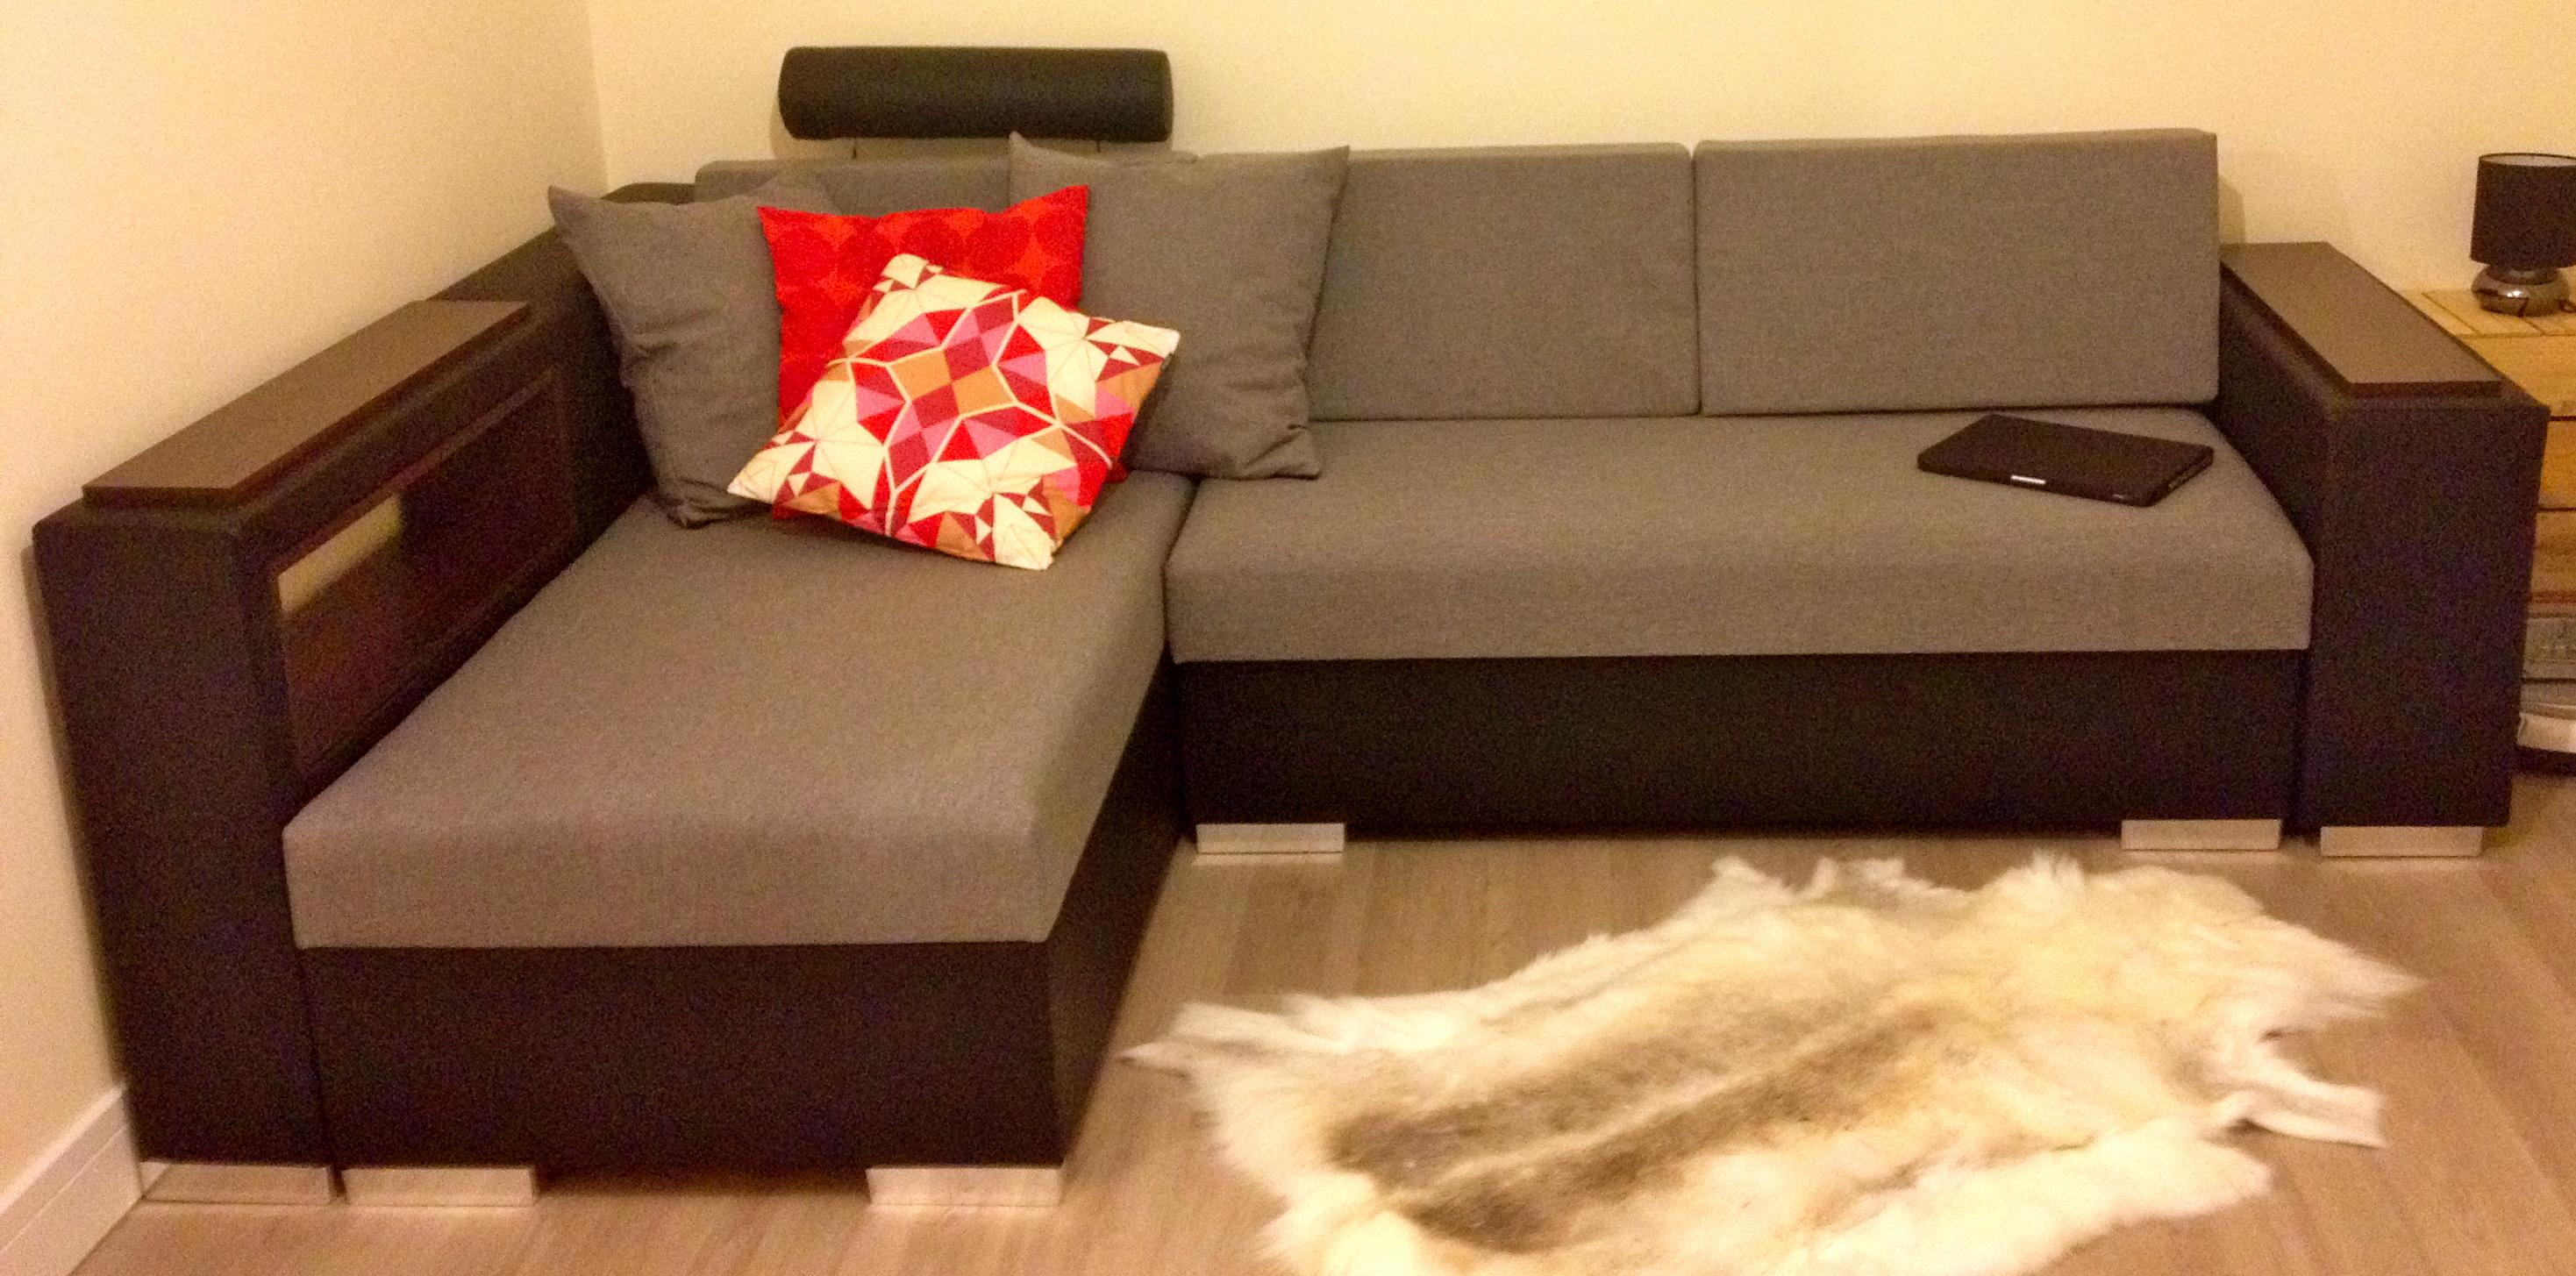 Storage Sofa Bed Multifunctional Cheap Space Saving